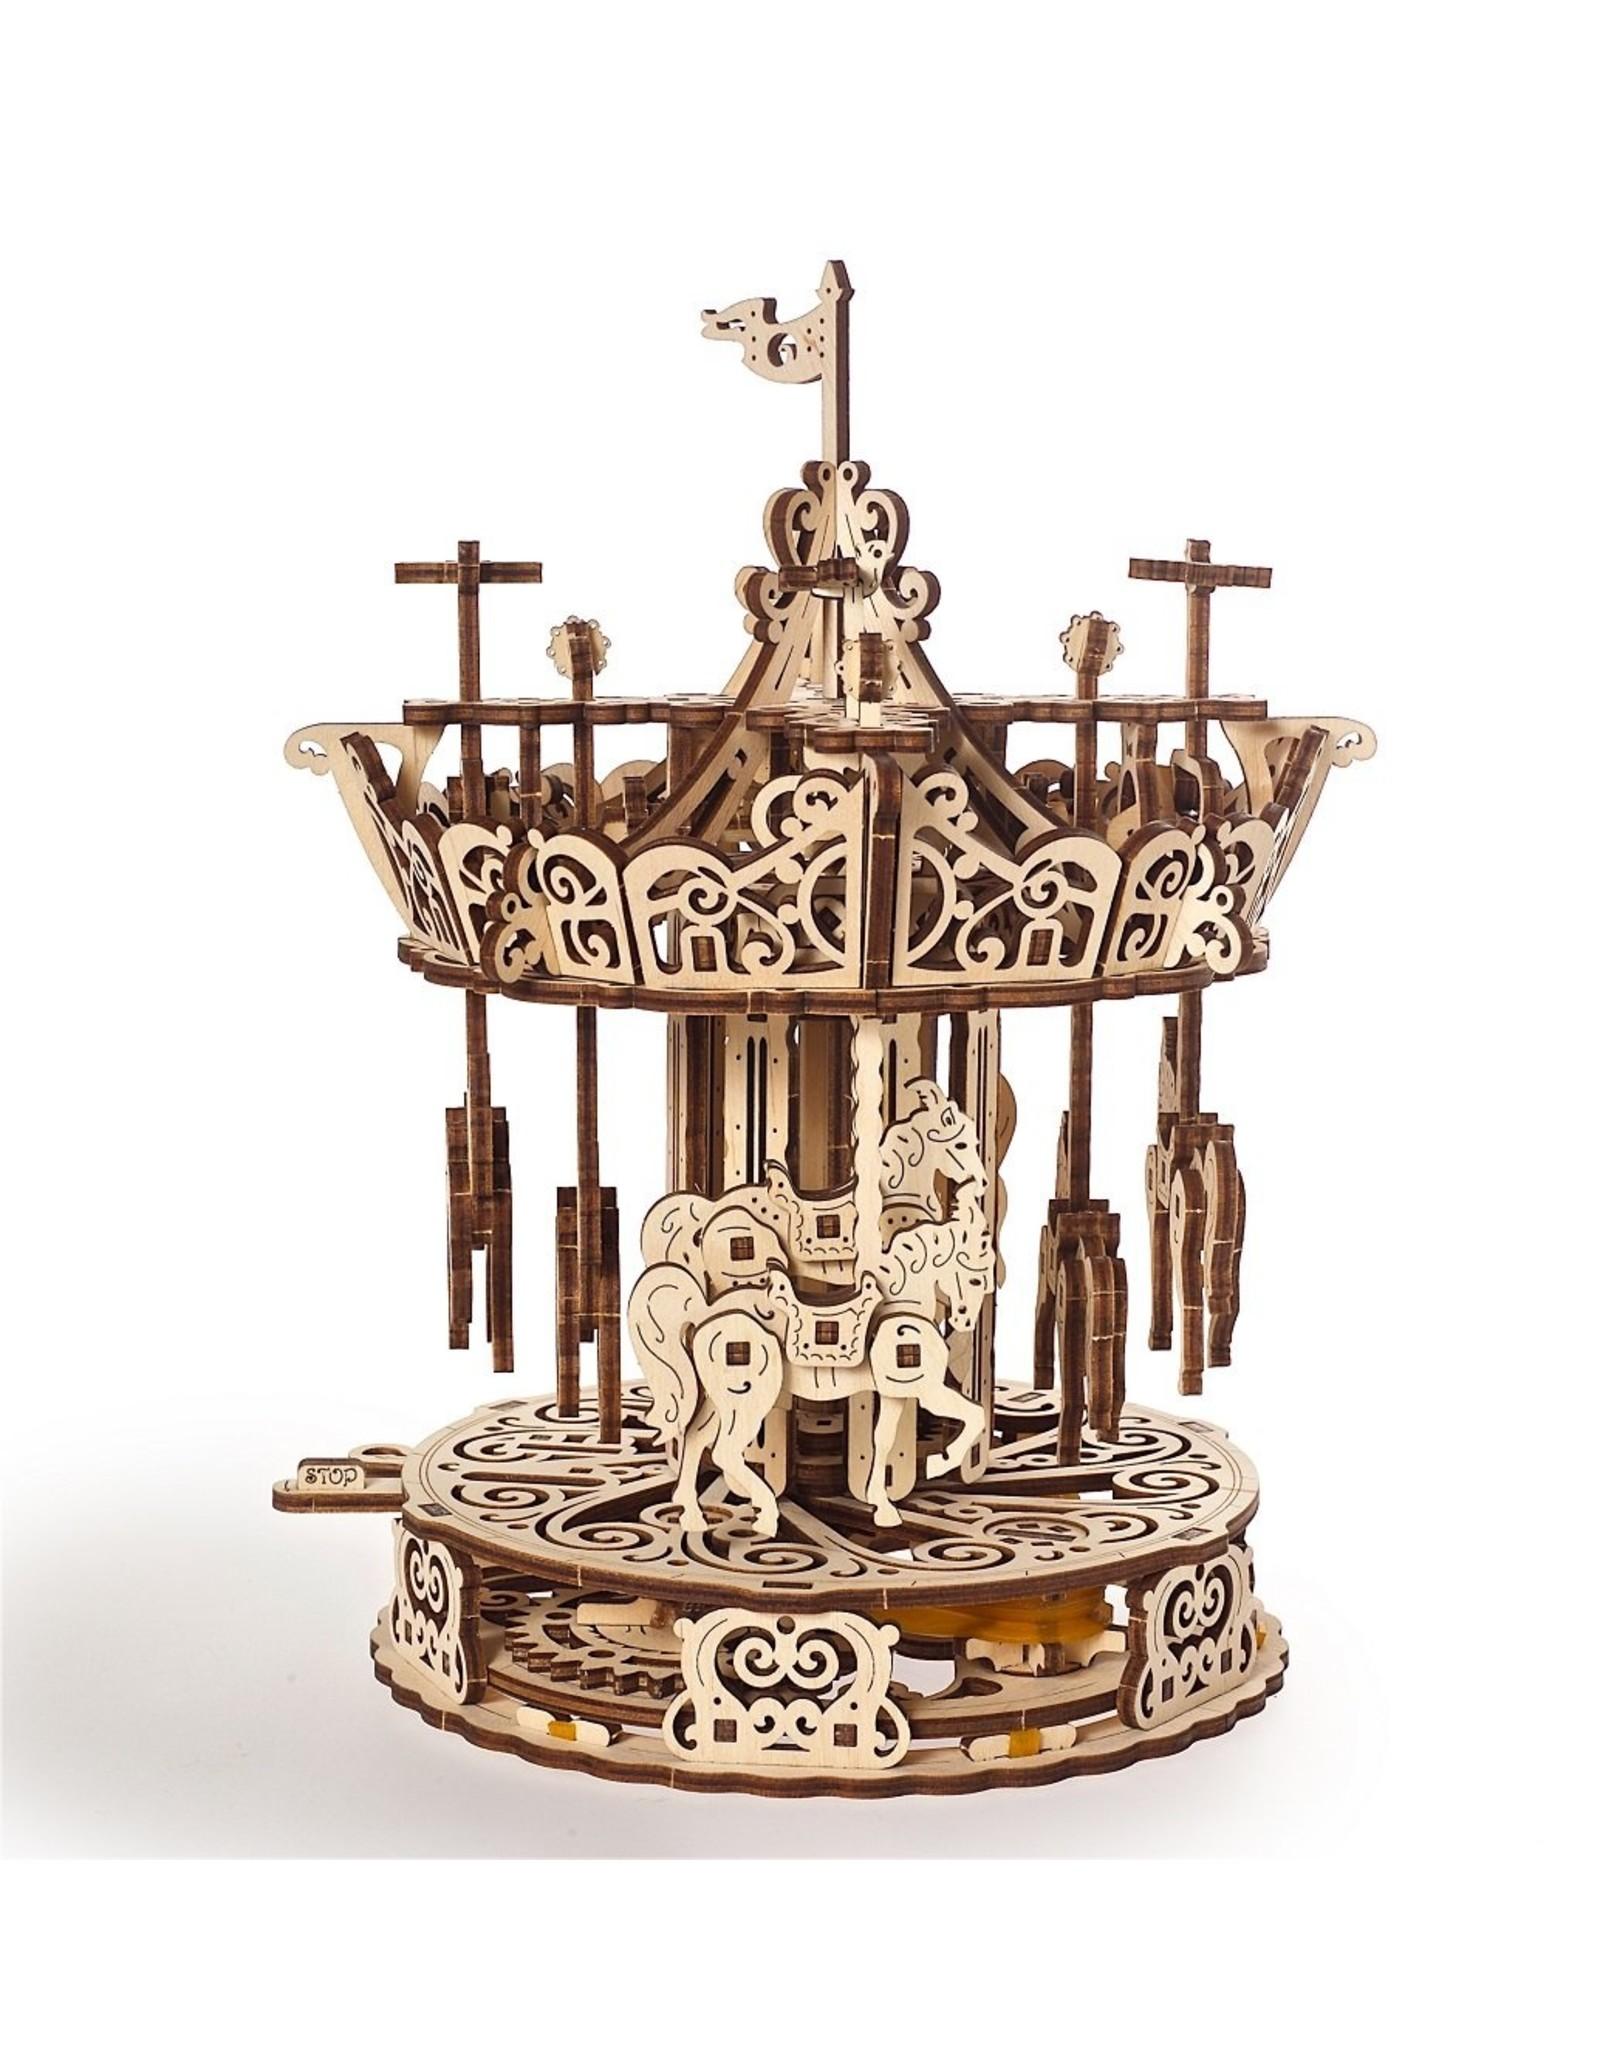 UGears Carousel Wood Model